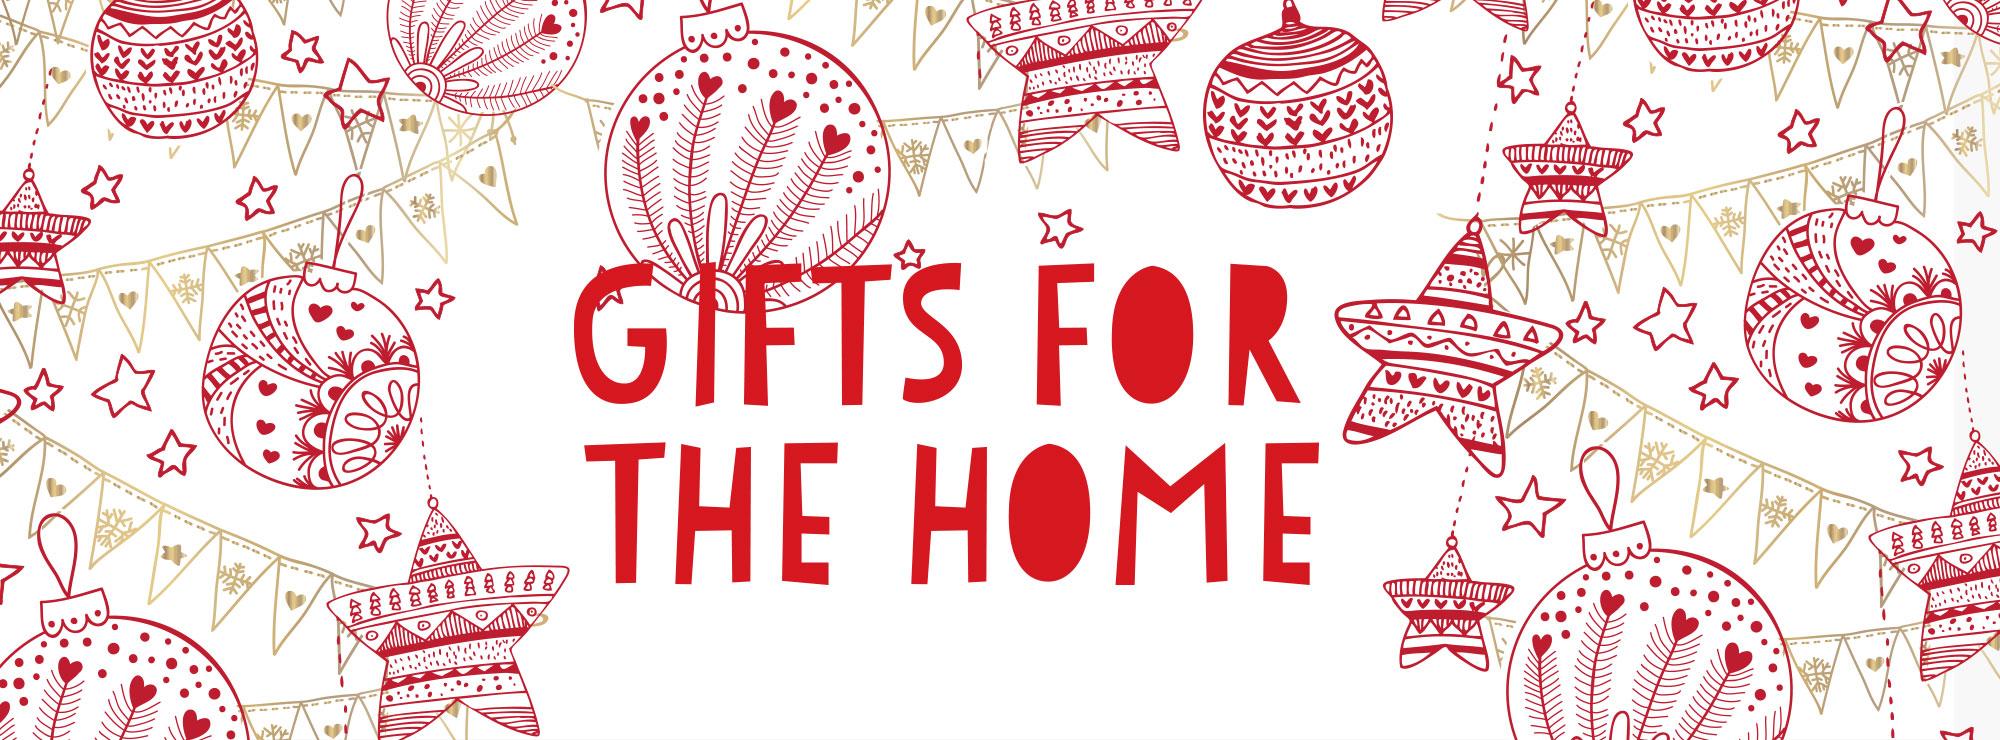 Gifts for Home - Christmas Gift Ideas - Christmas - Shop